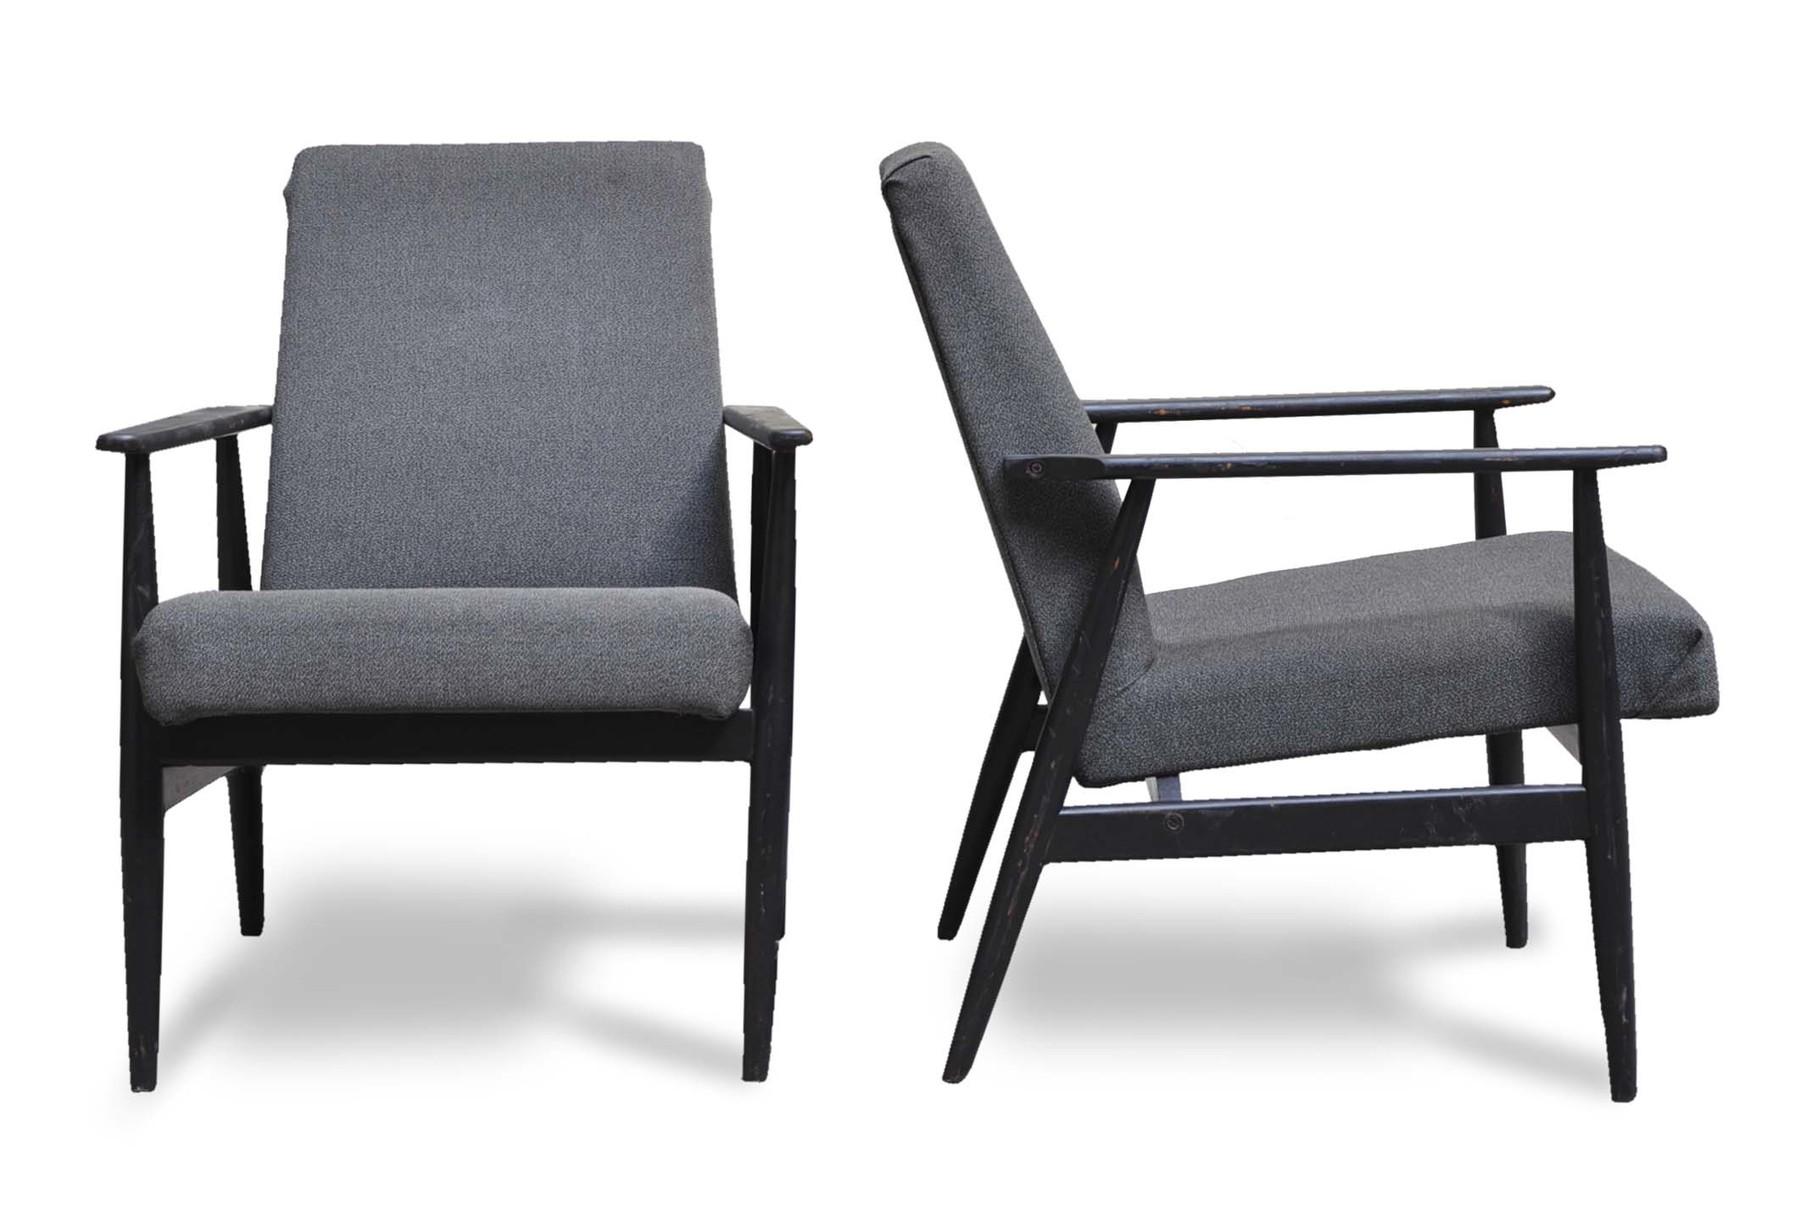 Poltrone anni \'50 stile scandinavo - Italian Vintage Sofa